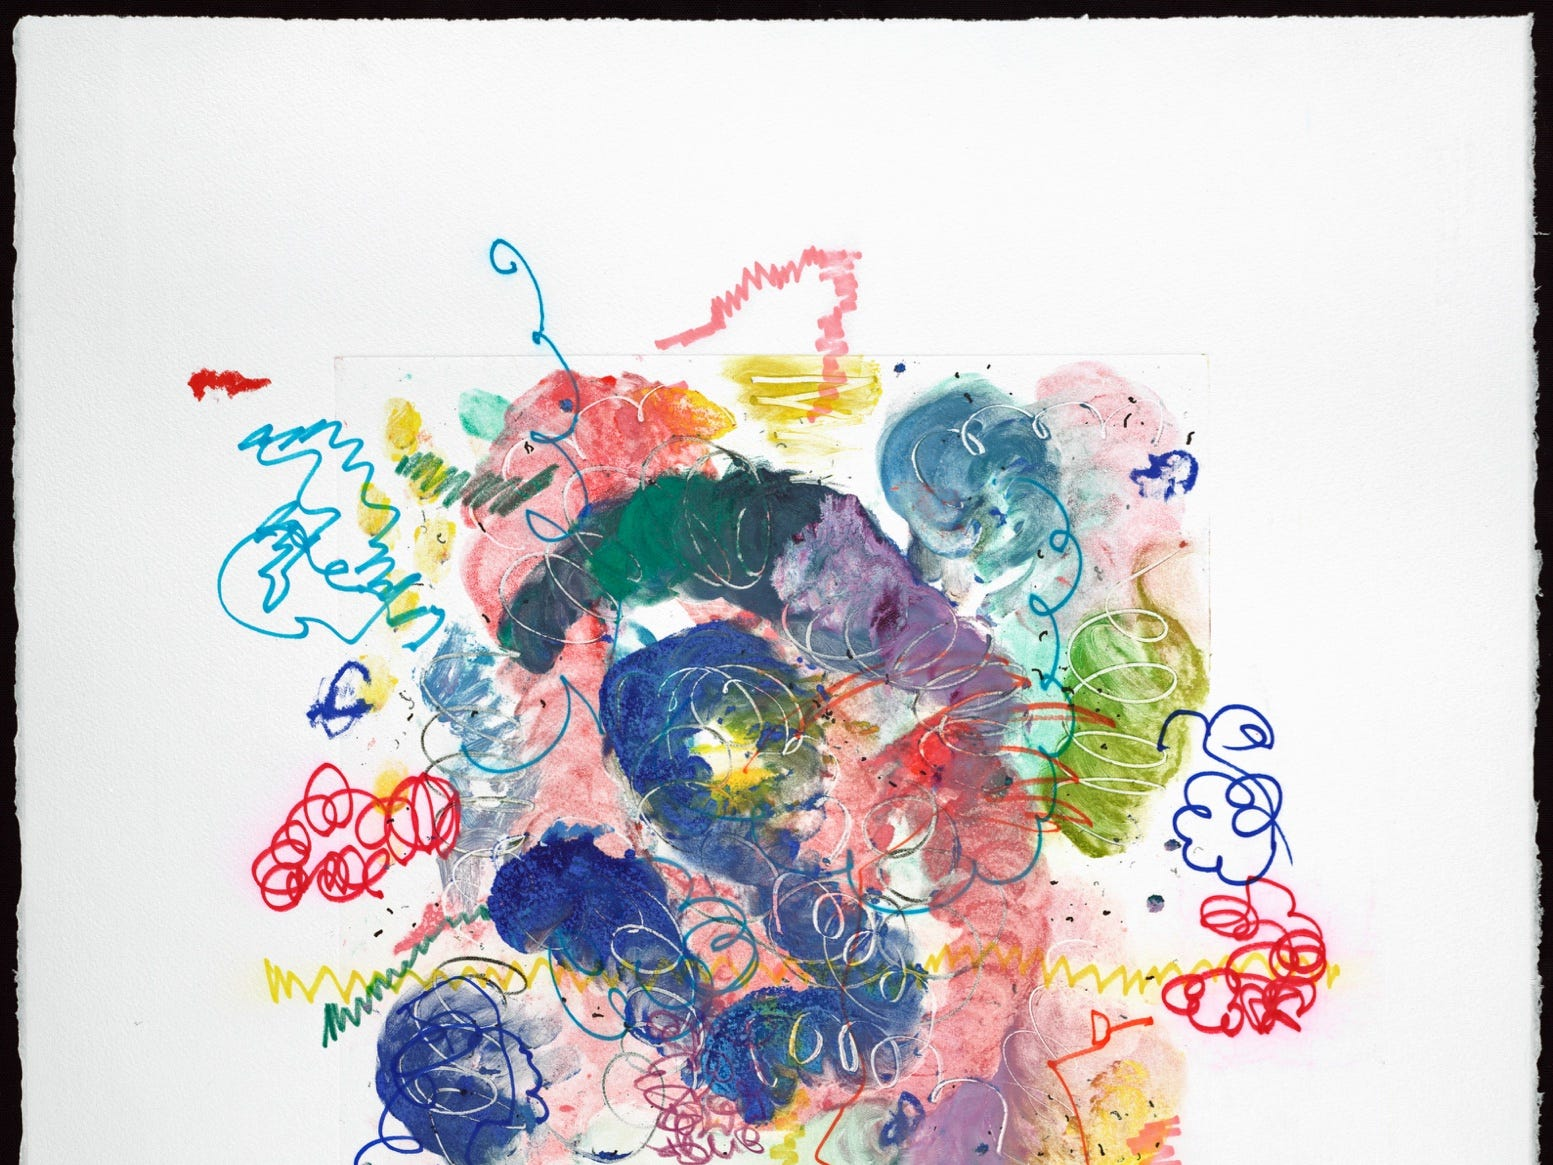 """I Will Wait -- Mumford & Sons"" ; Tammra Sigler for Art Aid"